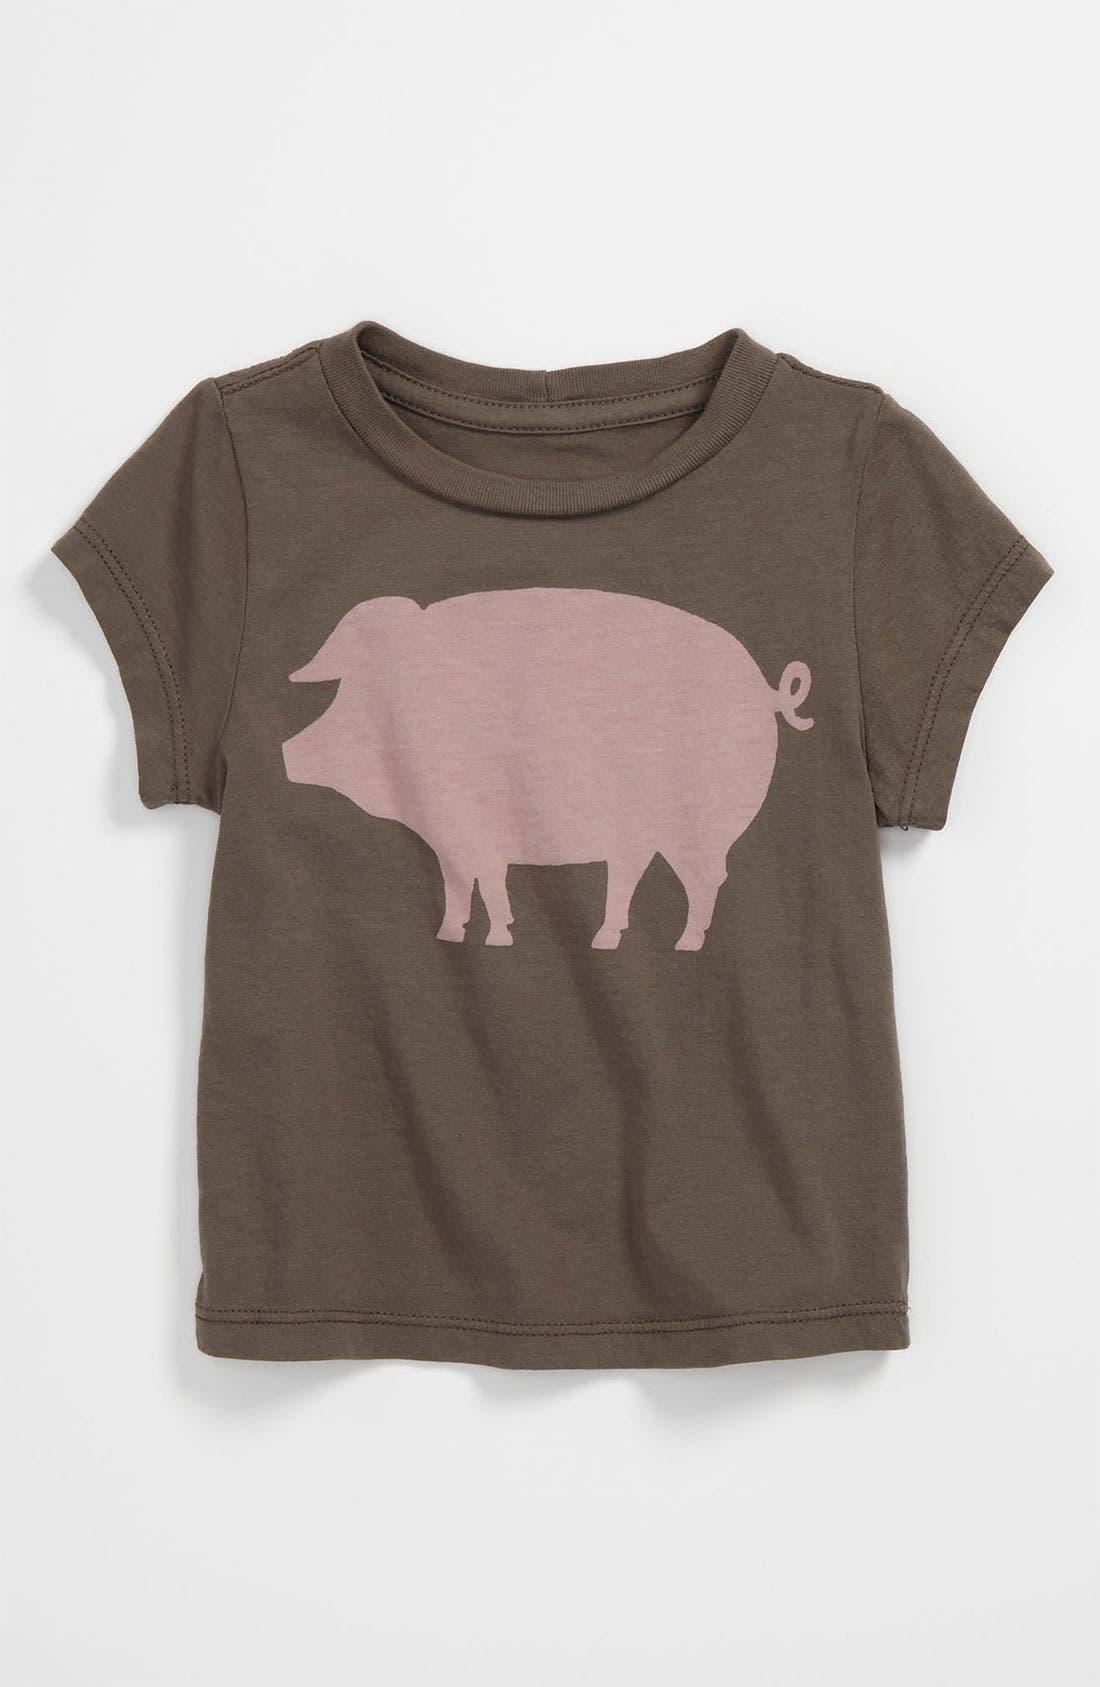 Alternate Image 1 Selected - Peek 'Oink' T-Shirt (Baby)